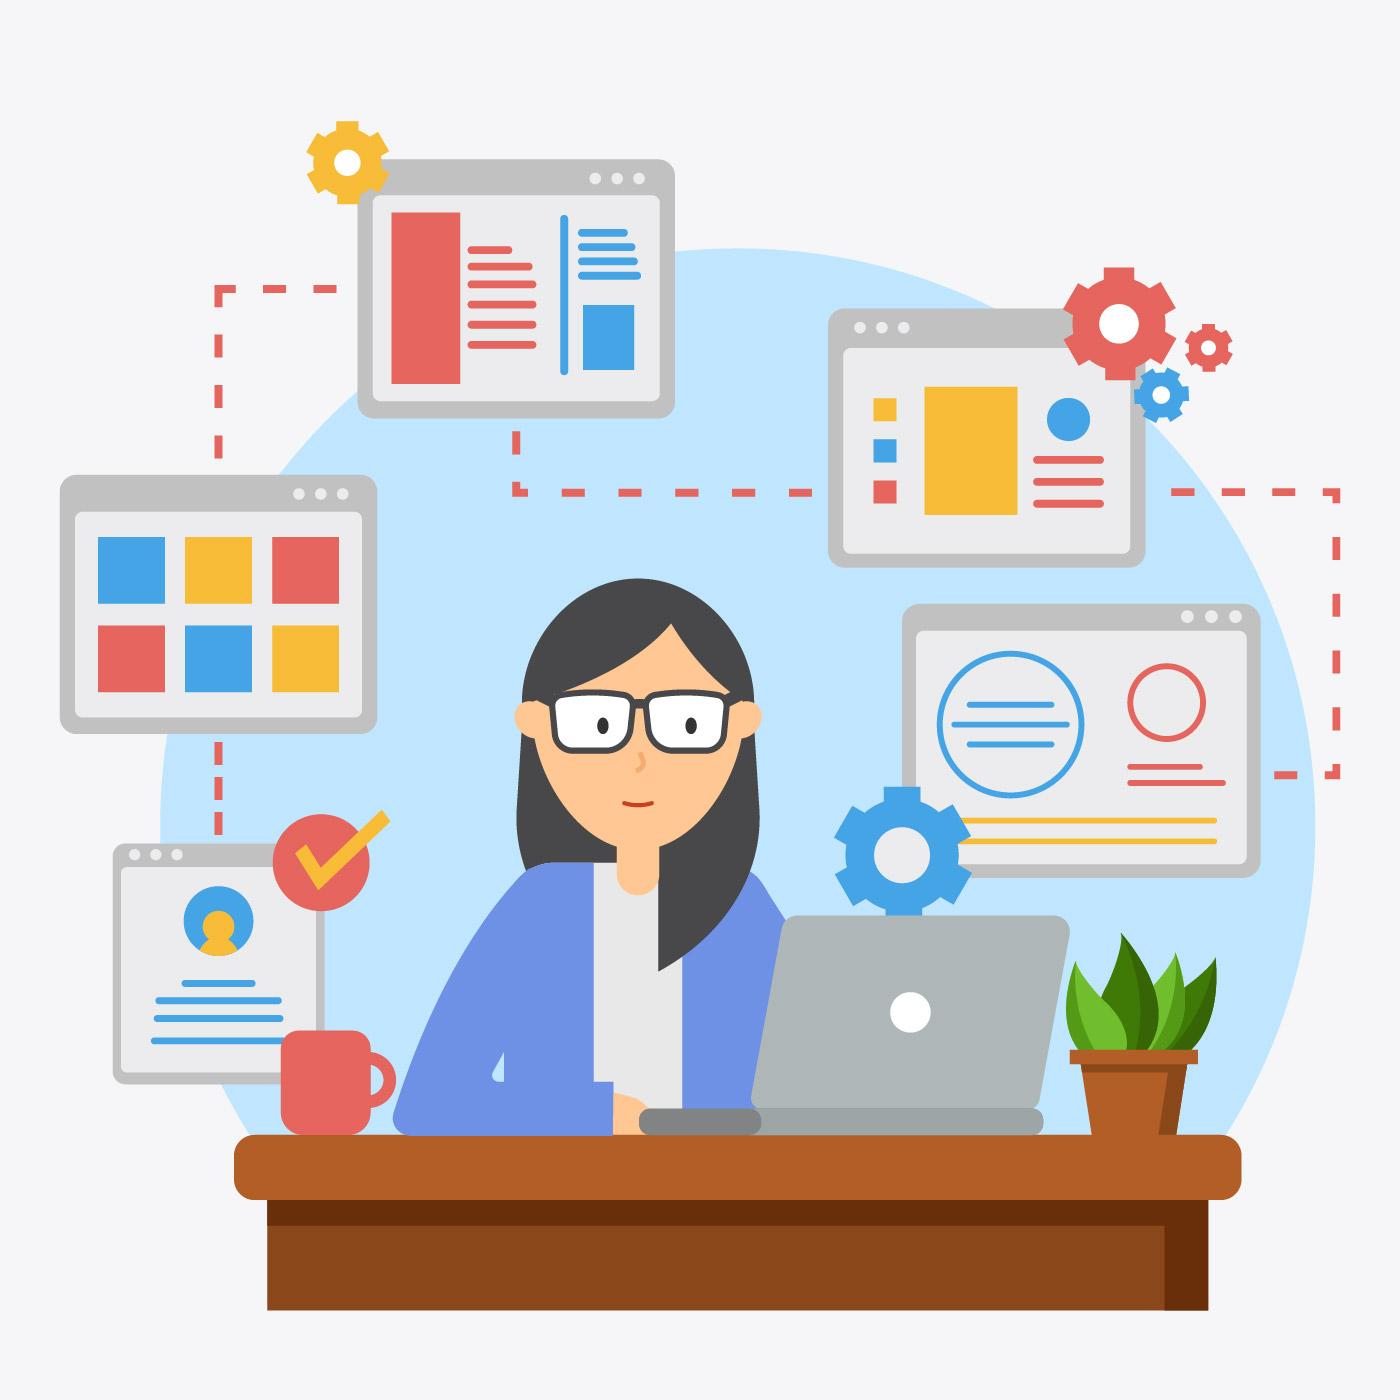 Vector Illustration Web Designs: Female Web Developer Illustration Vector